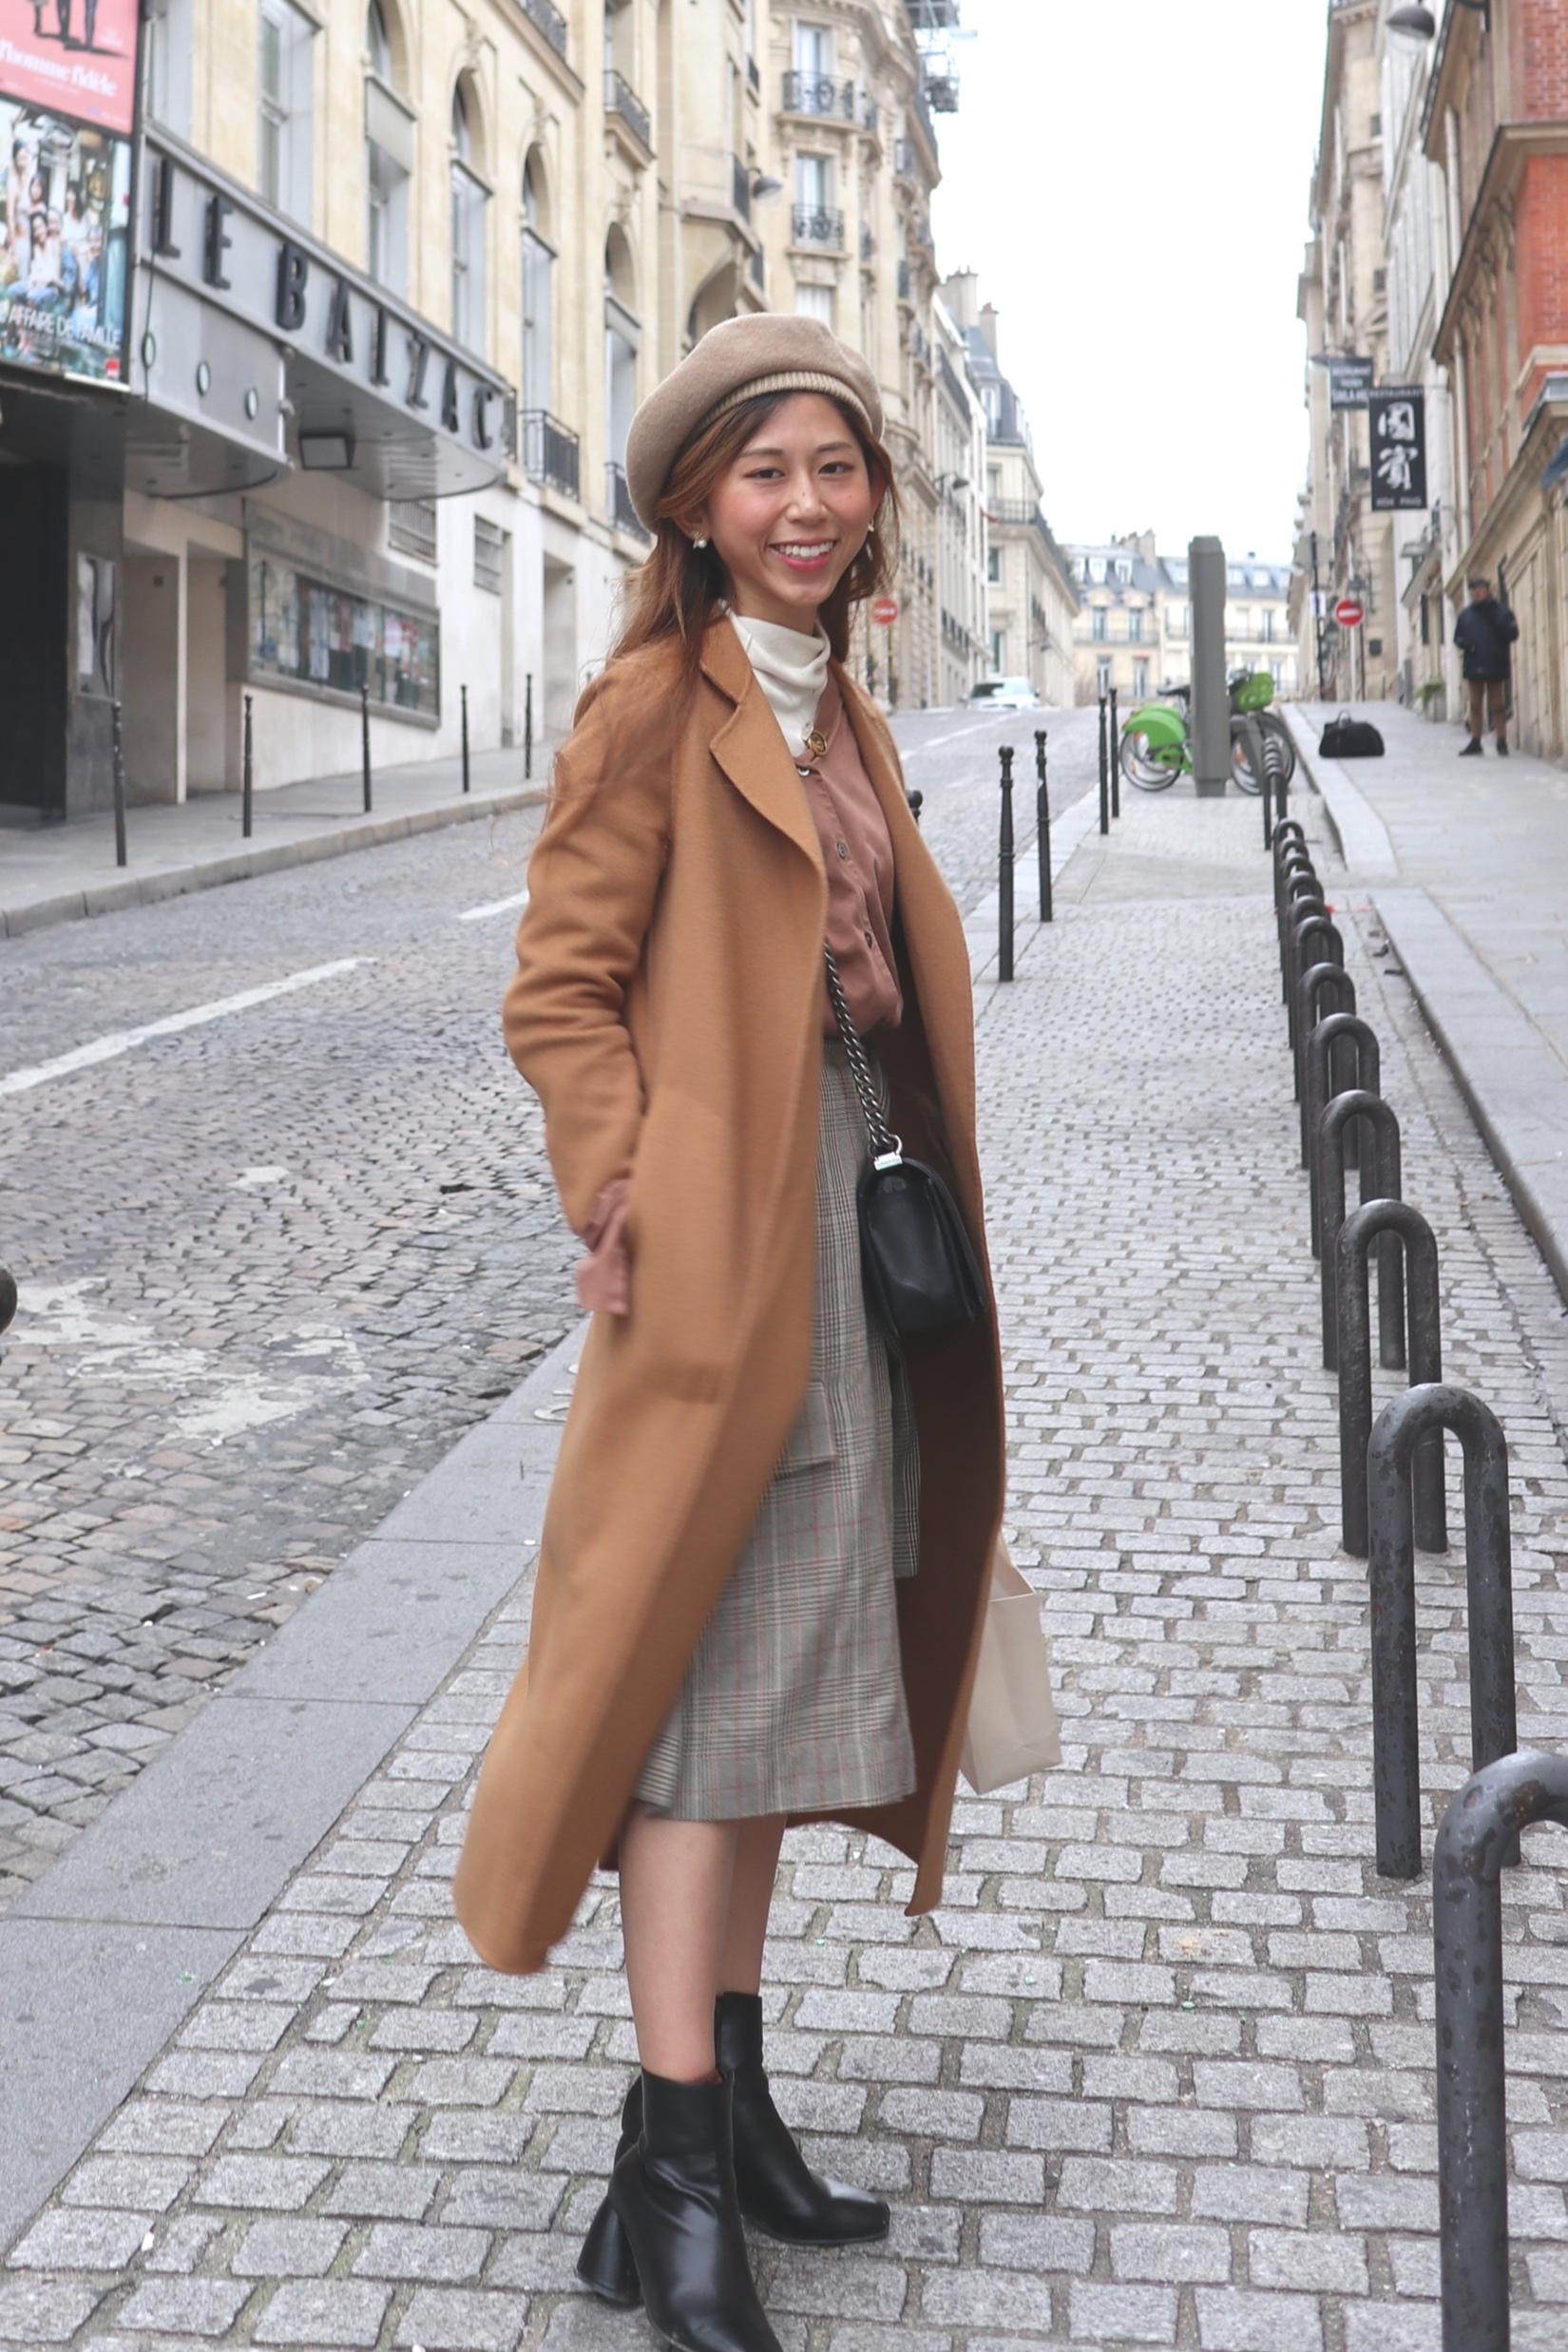 DP Christmas 2018: Christmas in Paris